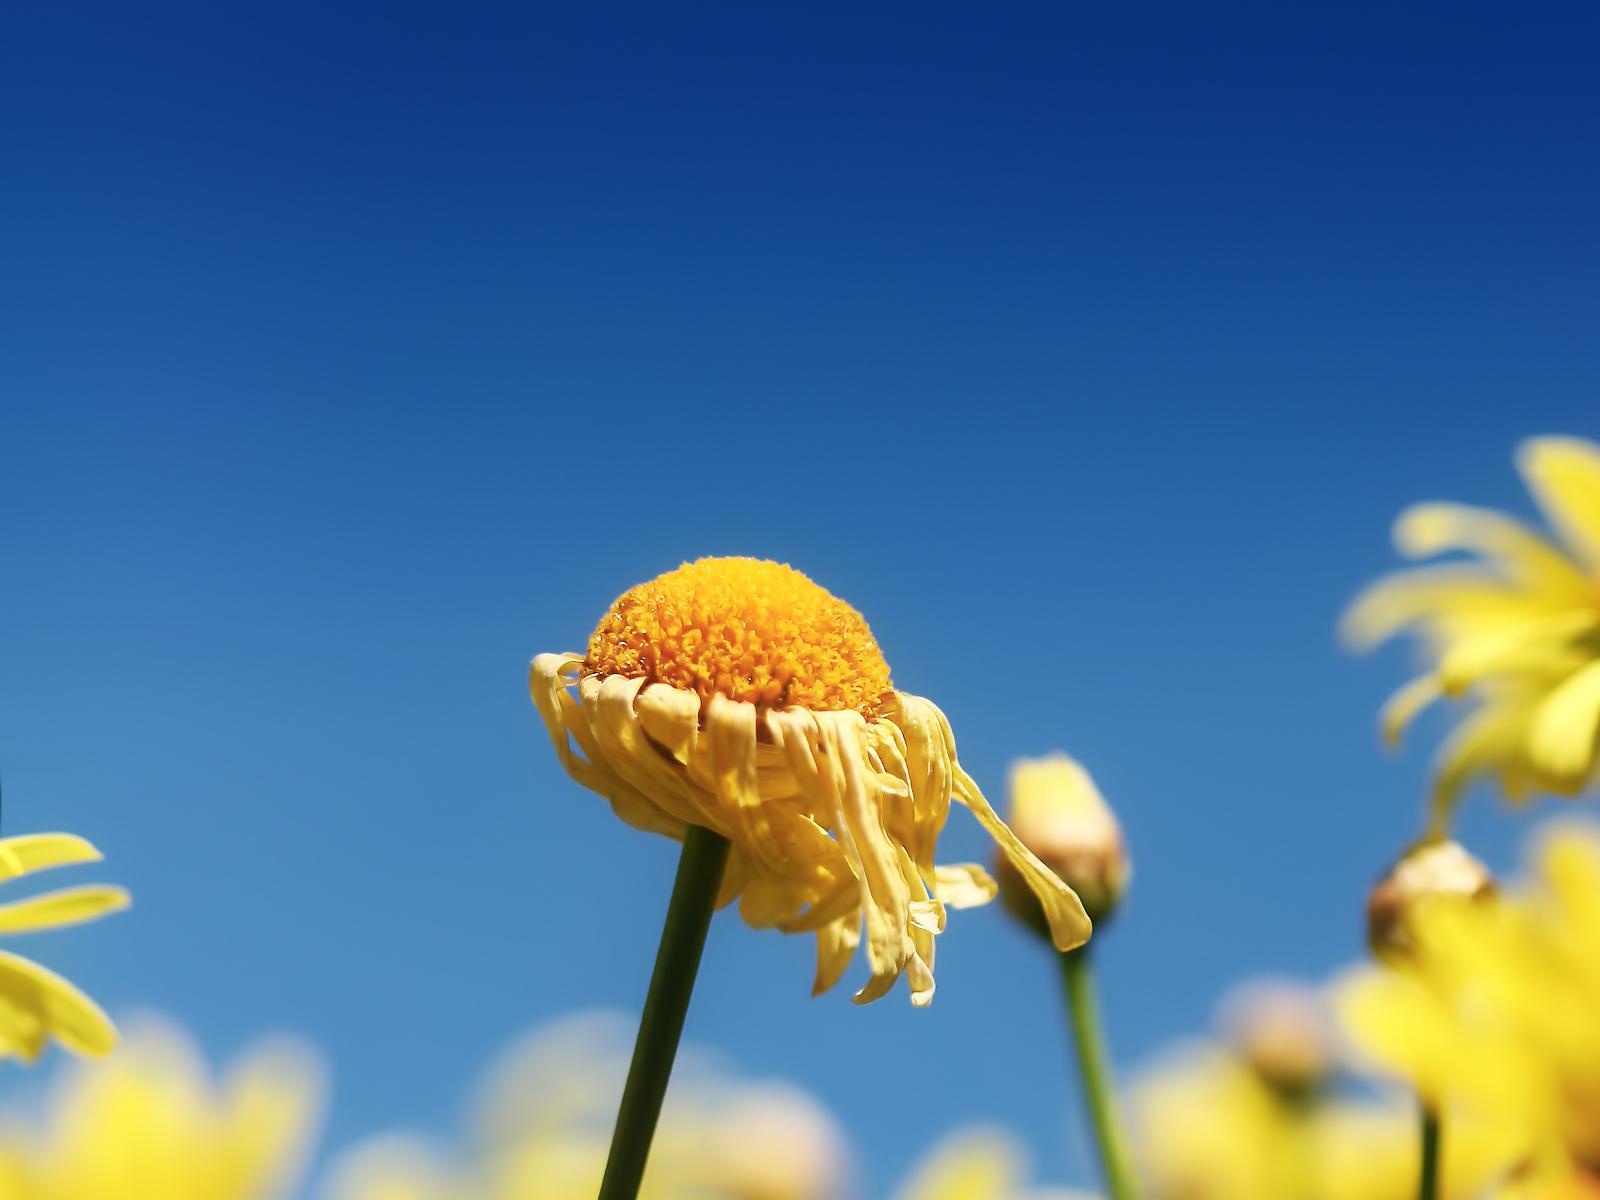 http://4.bp.blogspot.com/-UWCf-NIIseg/TxWWSdAT3JI/AAAAAAAAE80/Y25XgZ6IrnU/s1600/Nature+Wallpaper+0008.jpg